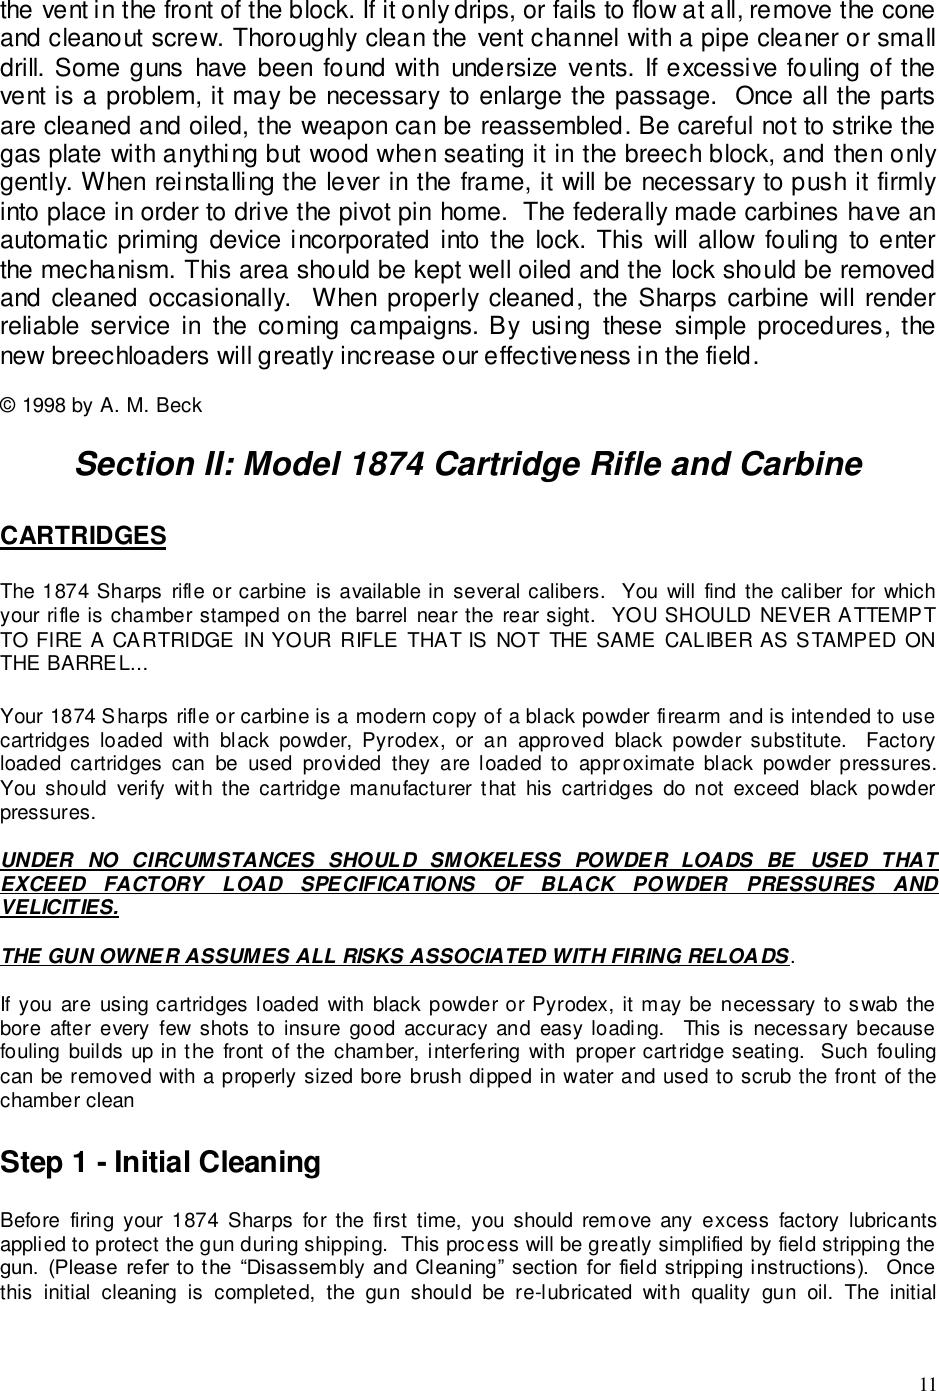 Tristar Vehicle 1863 Users Manual